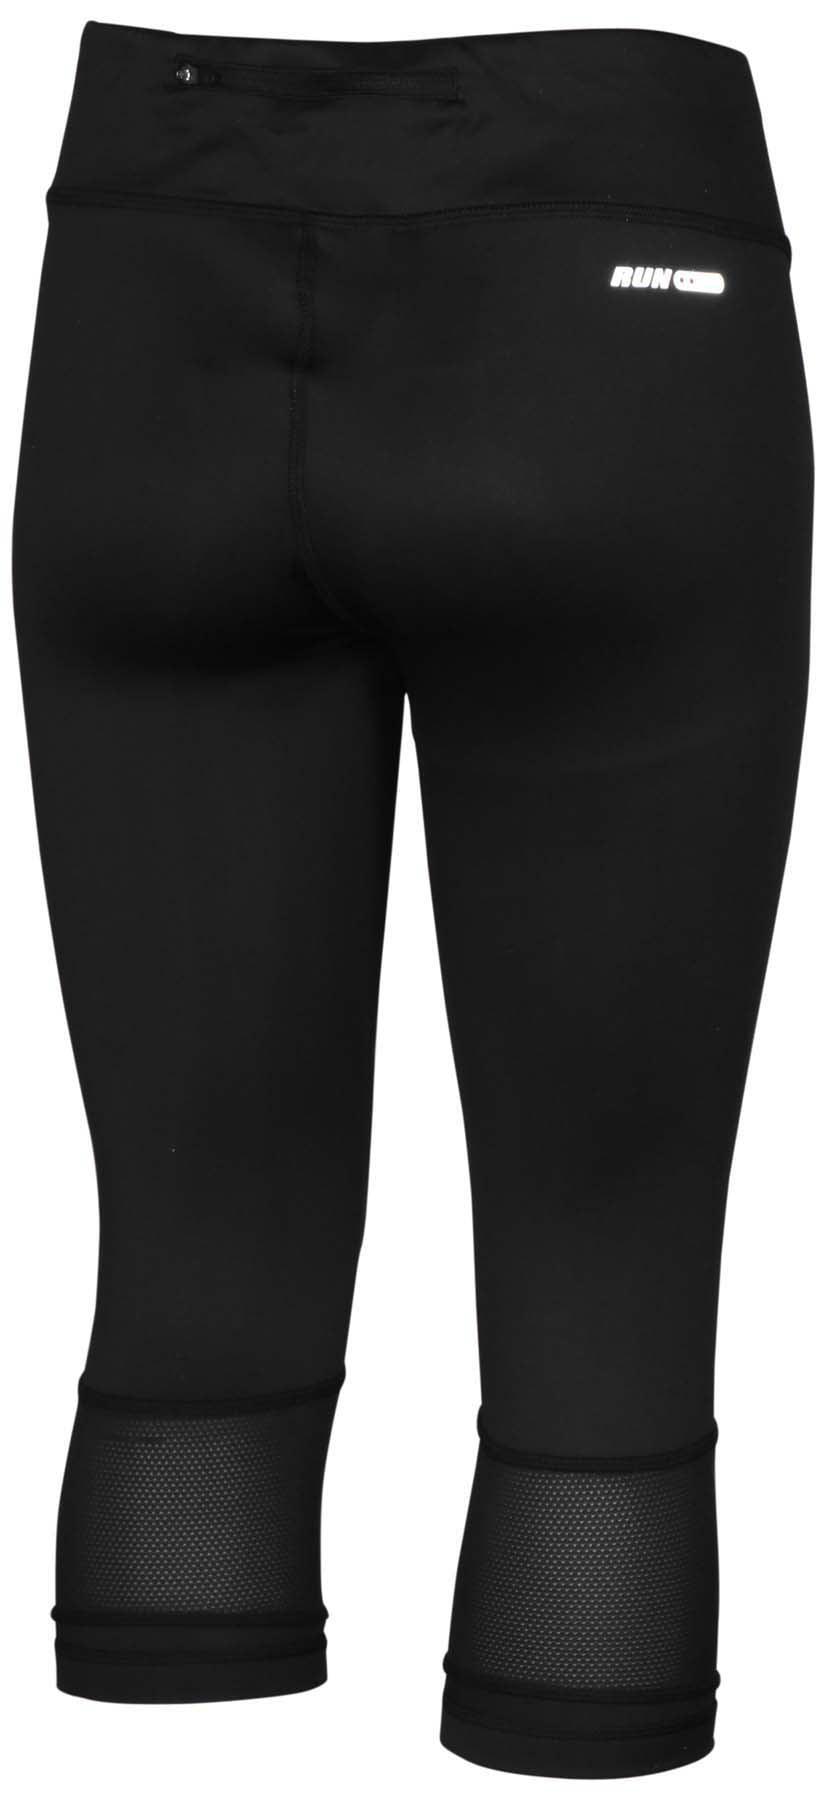 Crivit PRO - Crivit Pro Women s Performance Running Capris pants tights  leggings - Walmart.com f94ebcf3a9d